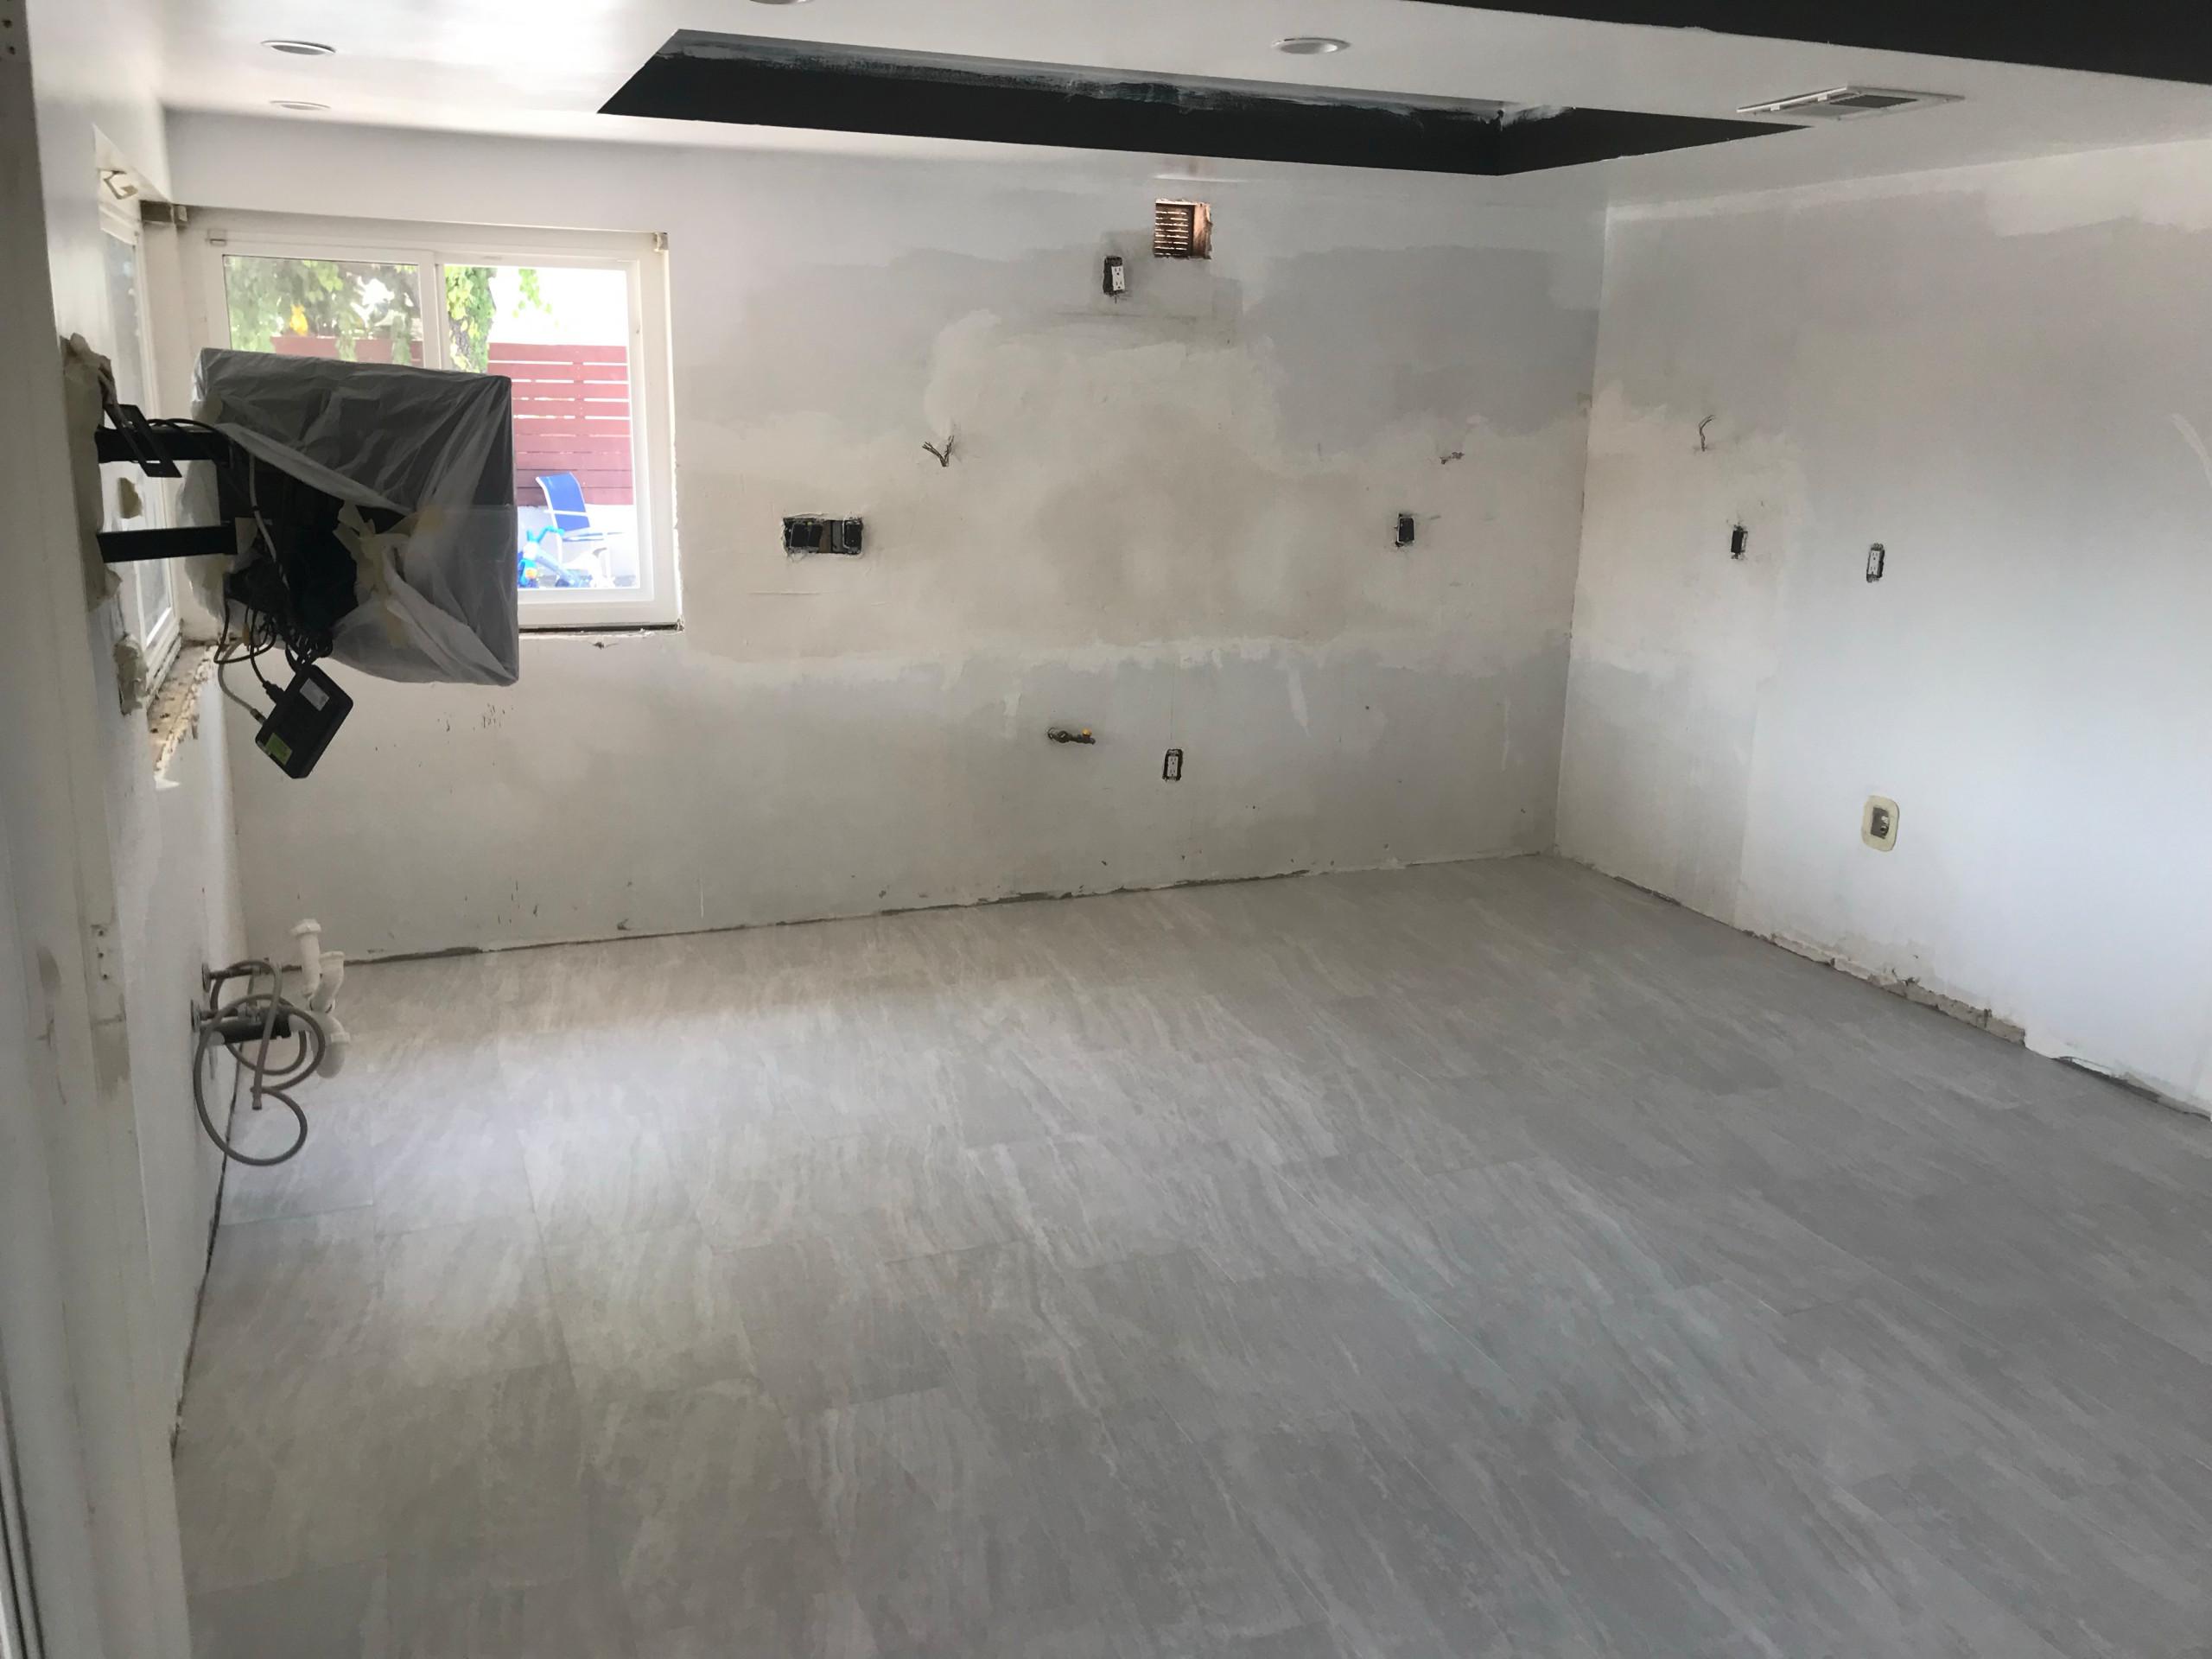 New flooring complete